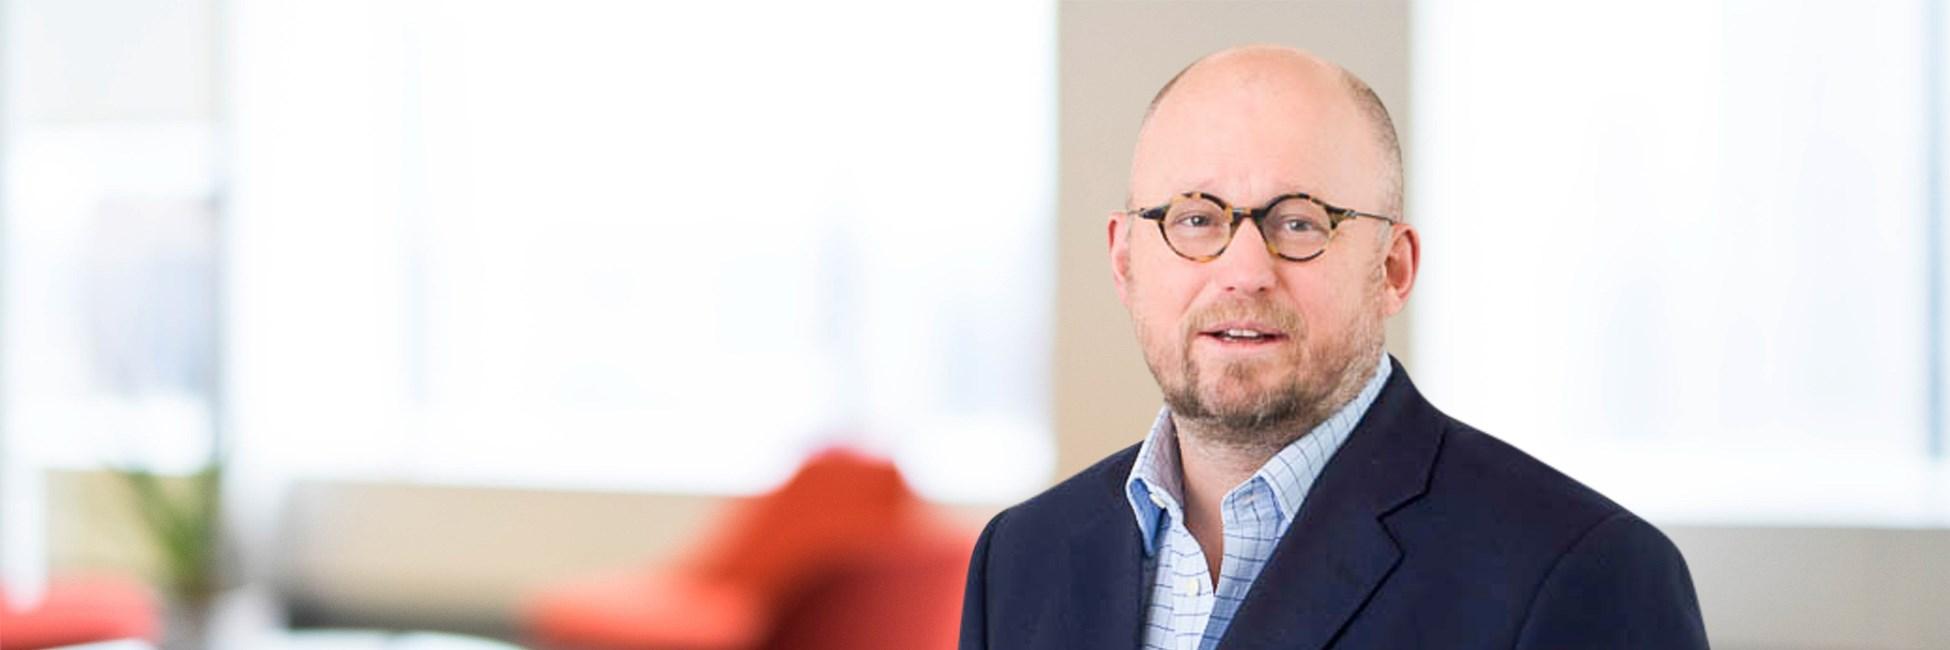 Matthew Meacham - Management Consultant - Bain & Company